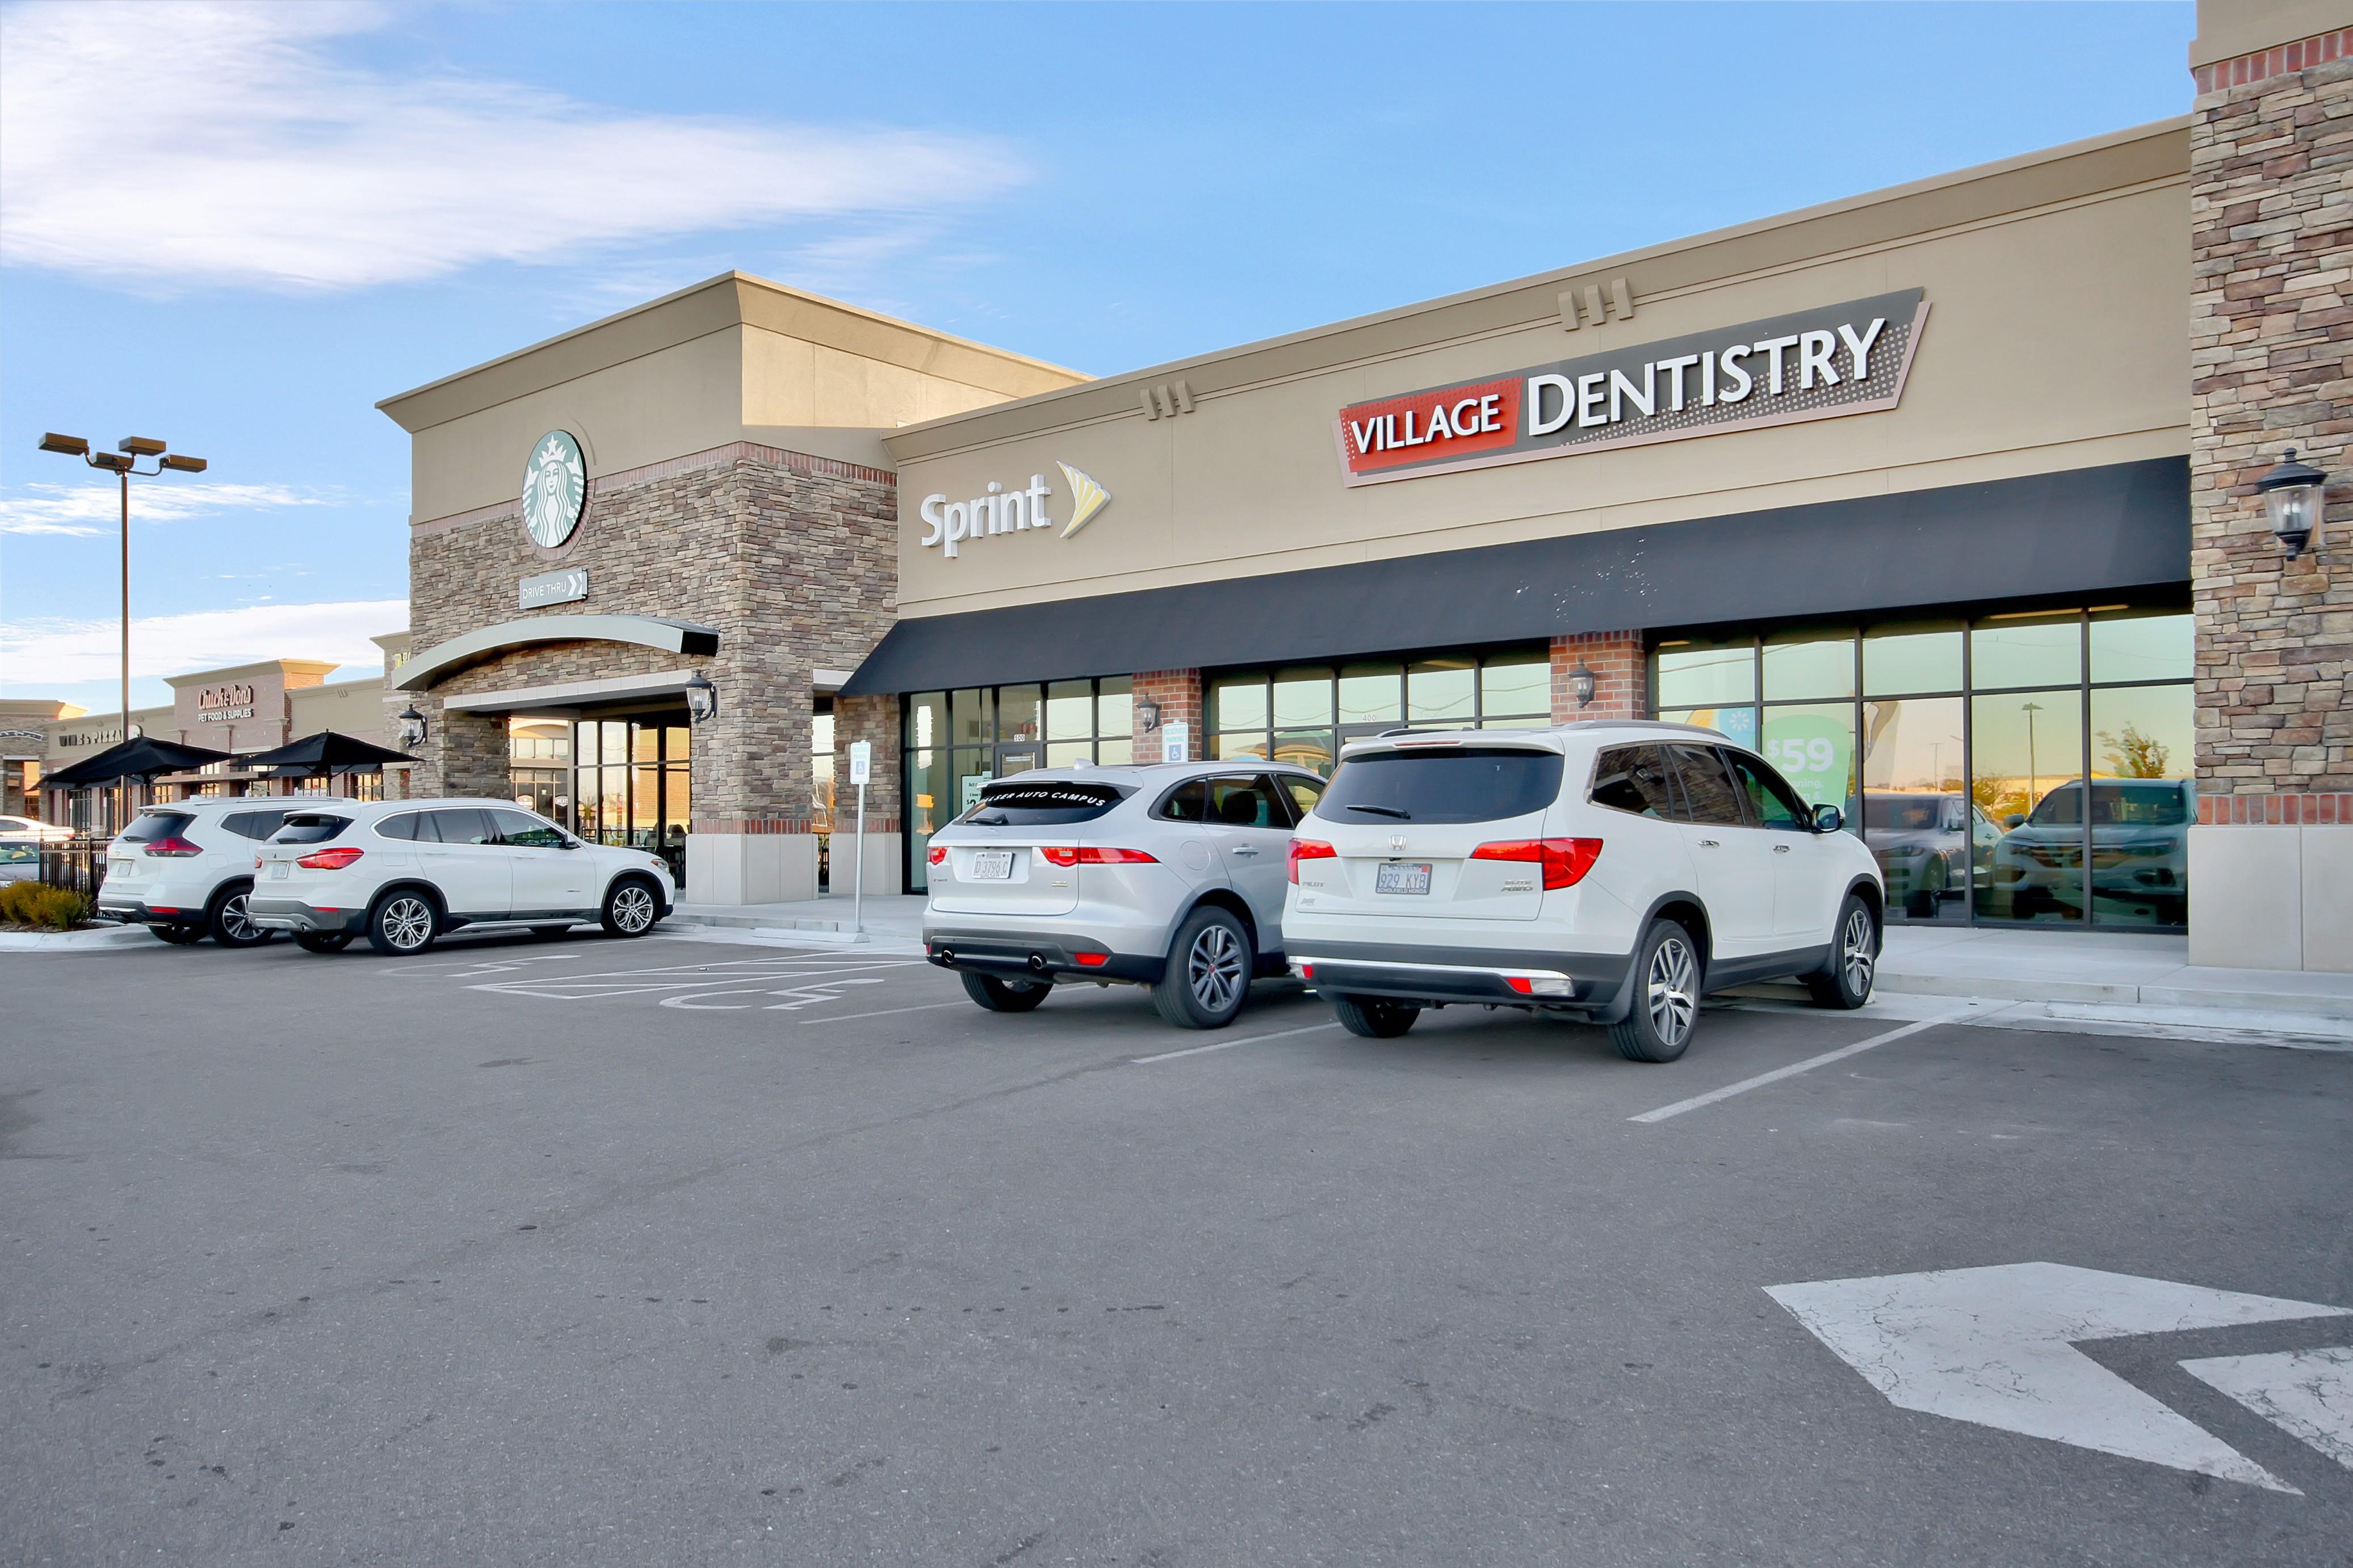 Village Dentistry image 2